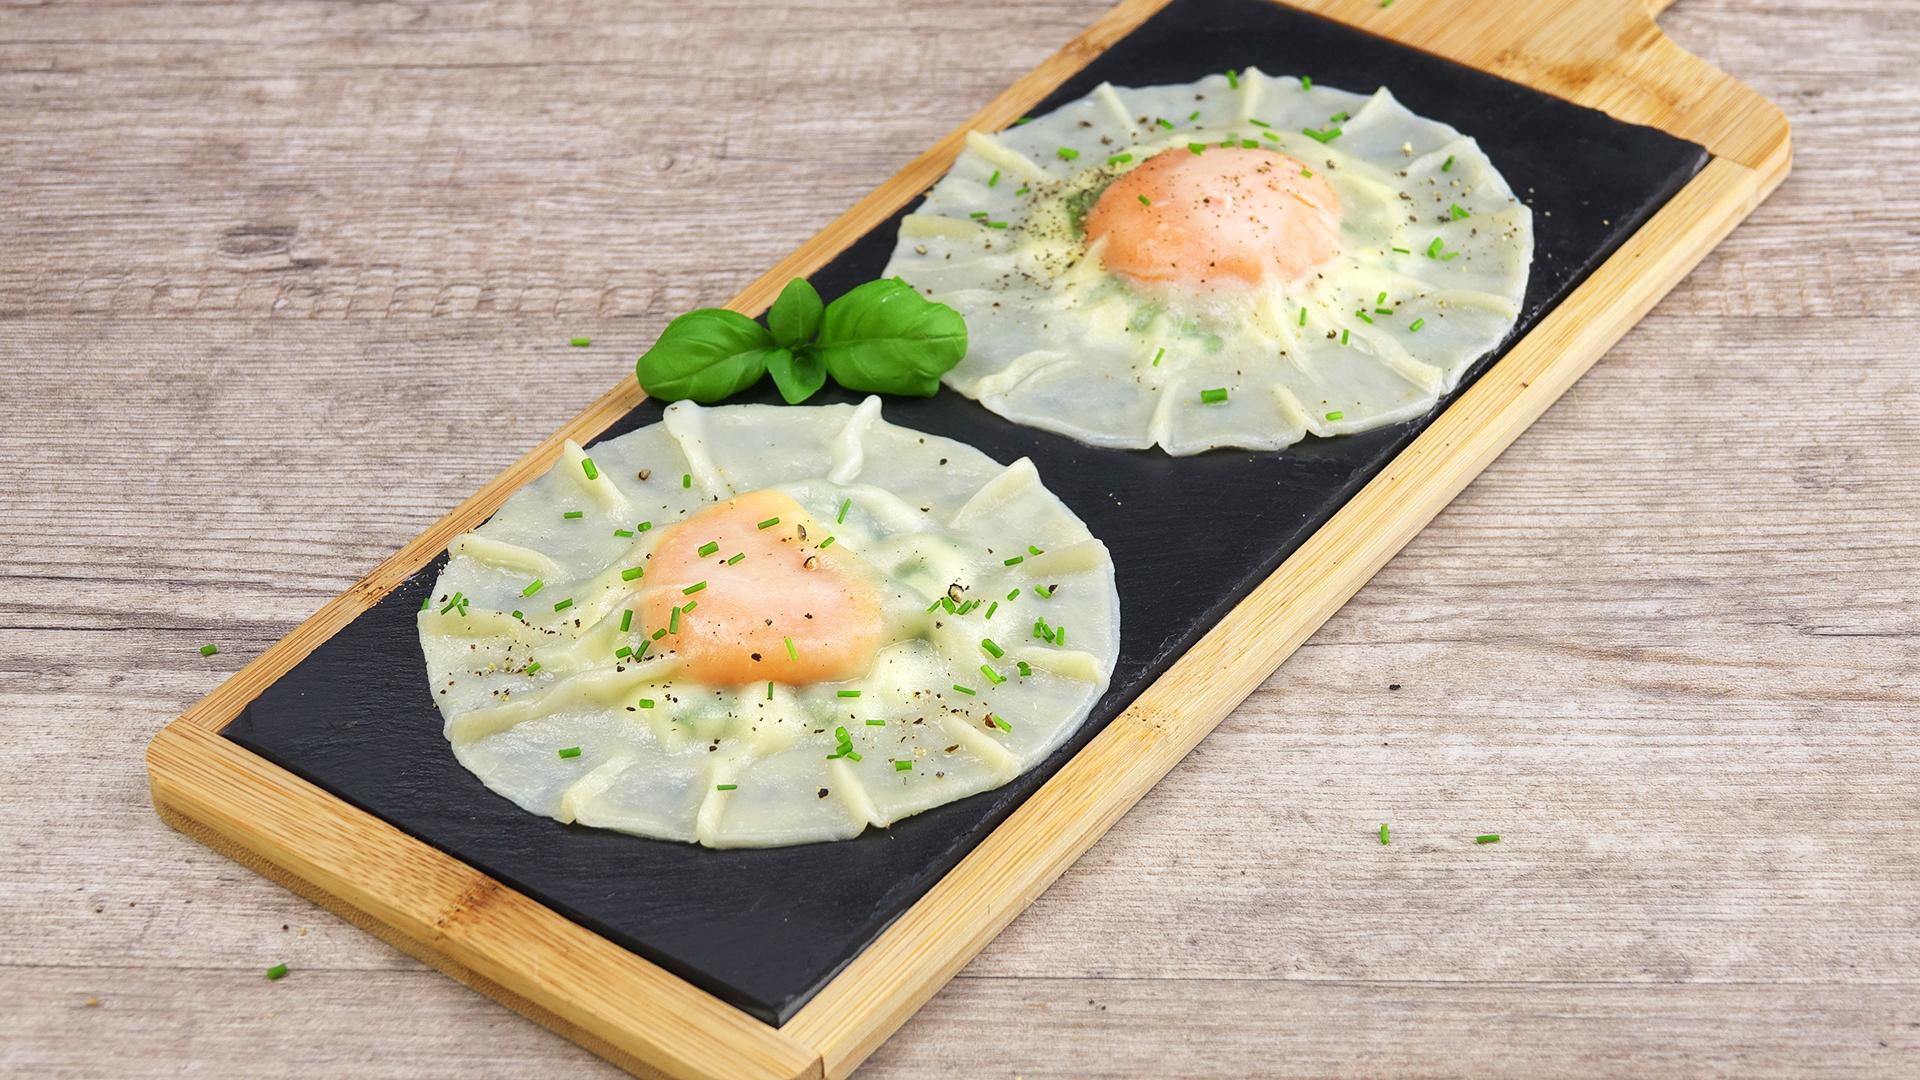 ravioli selber machen leckeres vegetarisches rezept. Black Bedroom Furniture Sets. Home Design Ideas